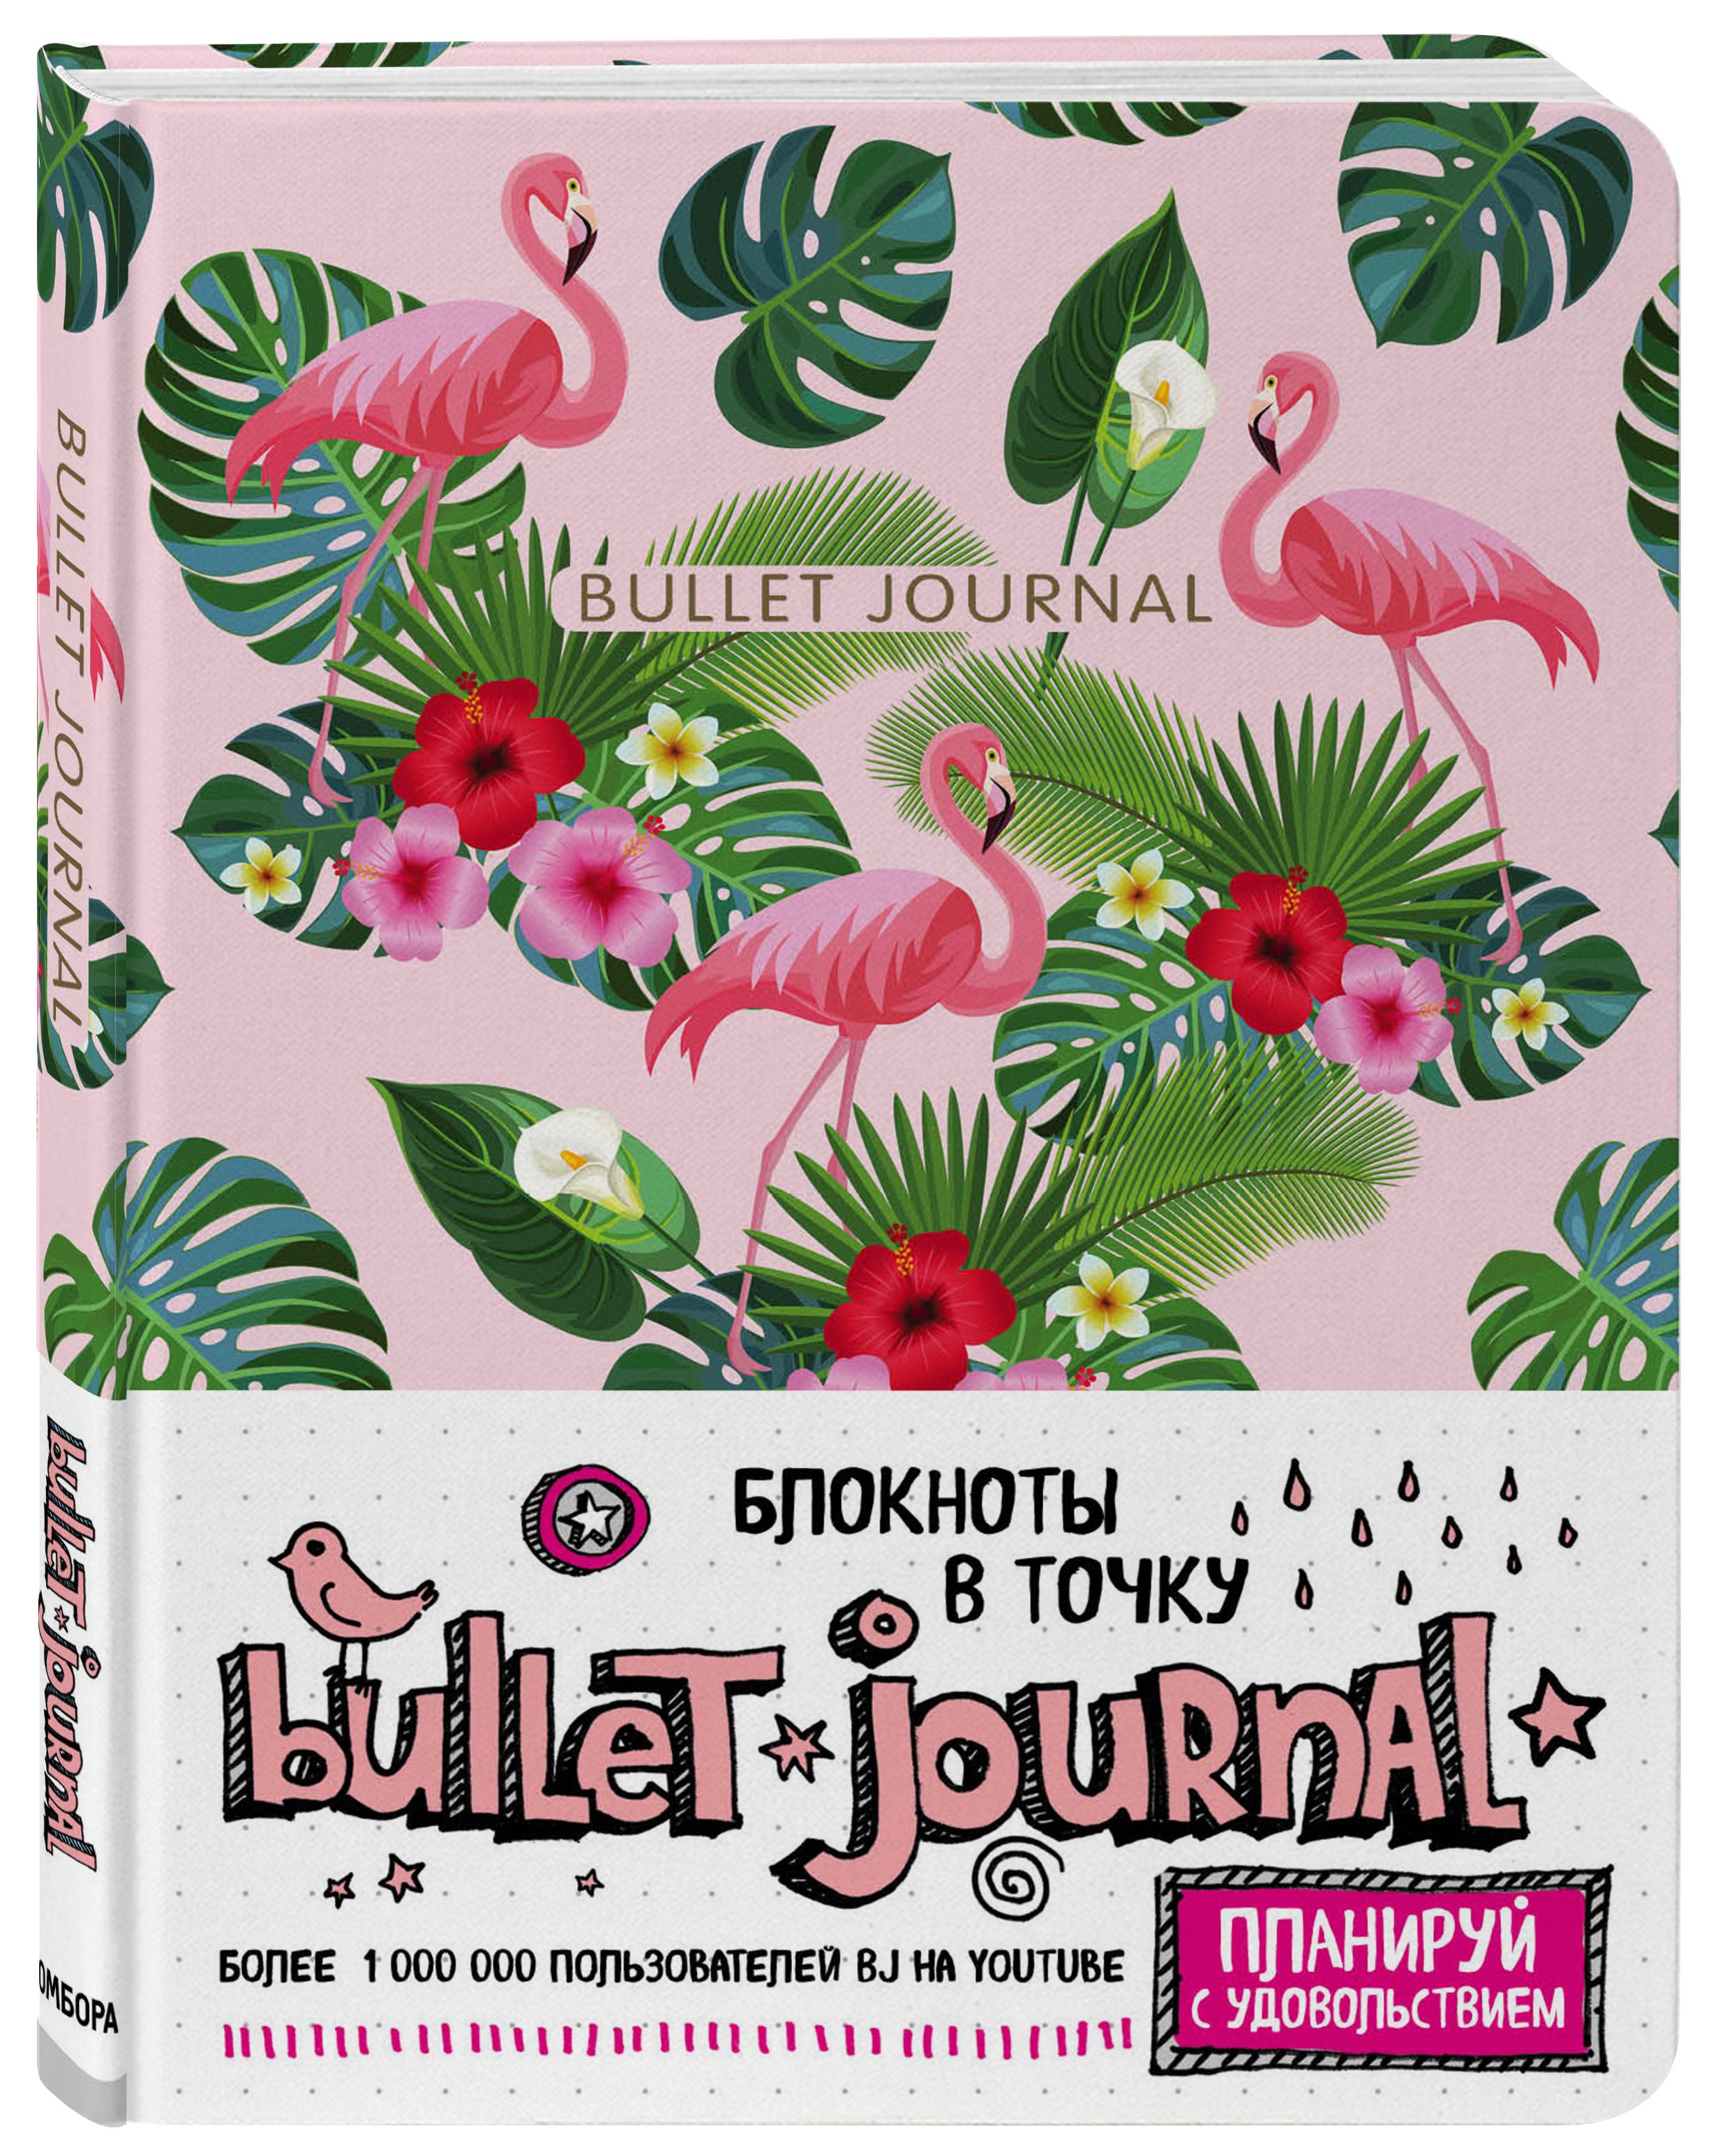 Блокнот в точку: Bullet Journal (фламинго) 2017 new a5 business notebook line meeting diary journal gift buckle journal notepad diary planner office